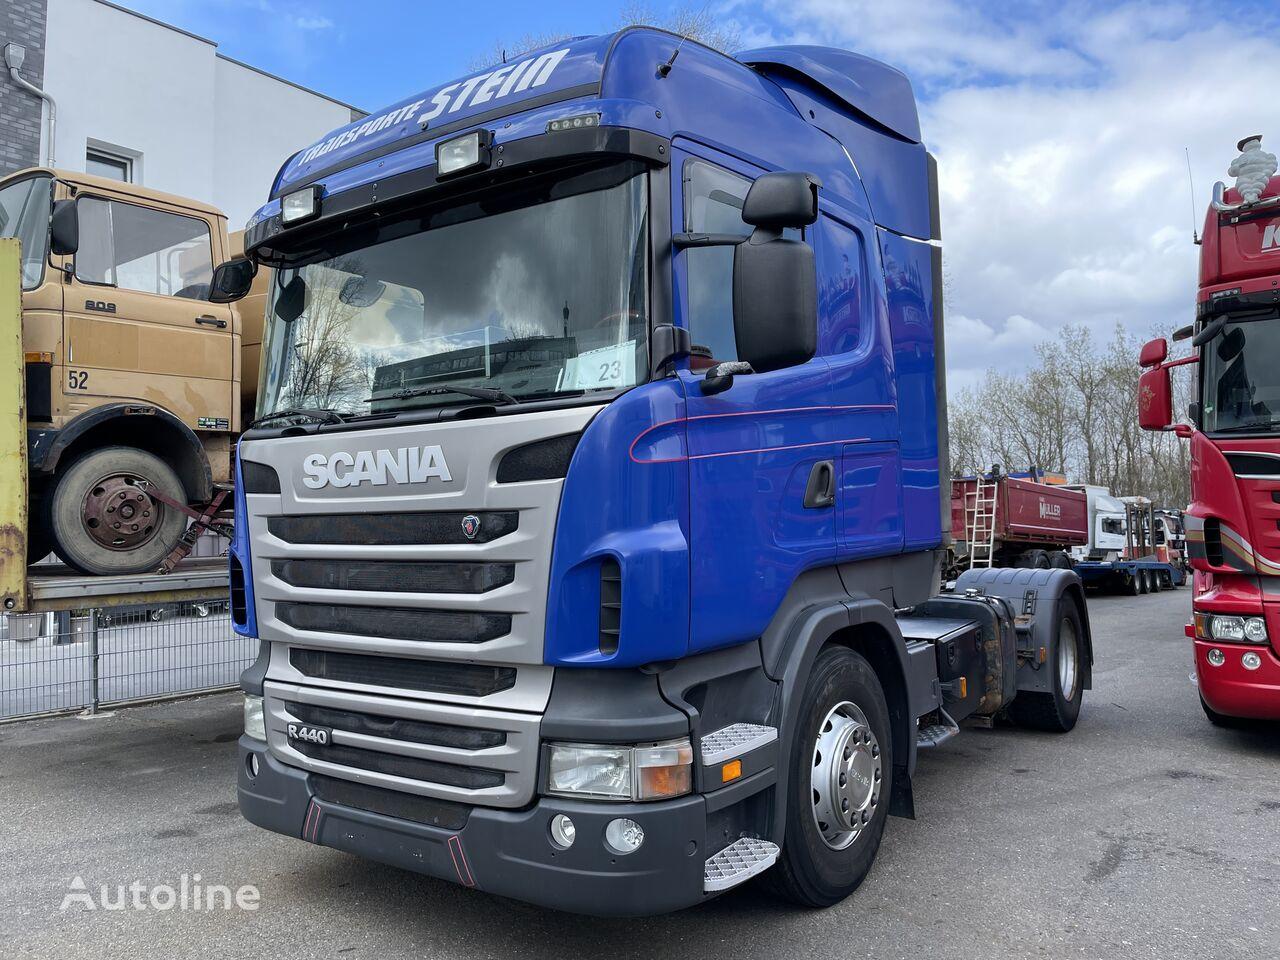 SCANIA Scania R440 Retarder E5 Kipphydraulik German Truck Retarder tractora